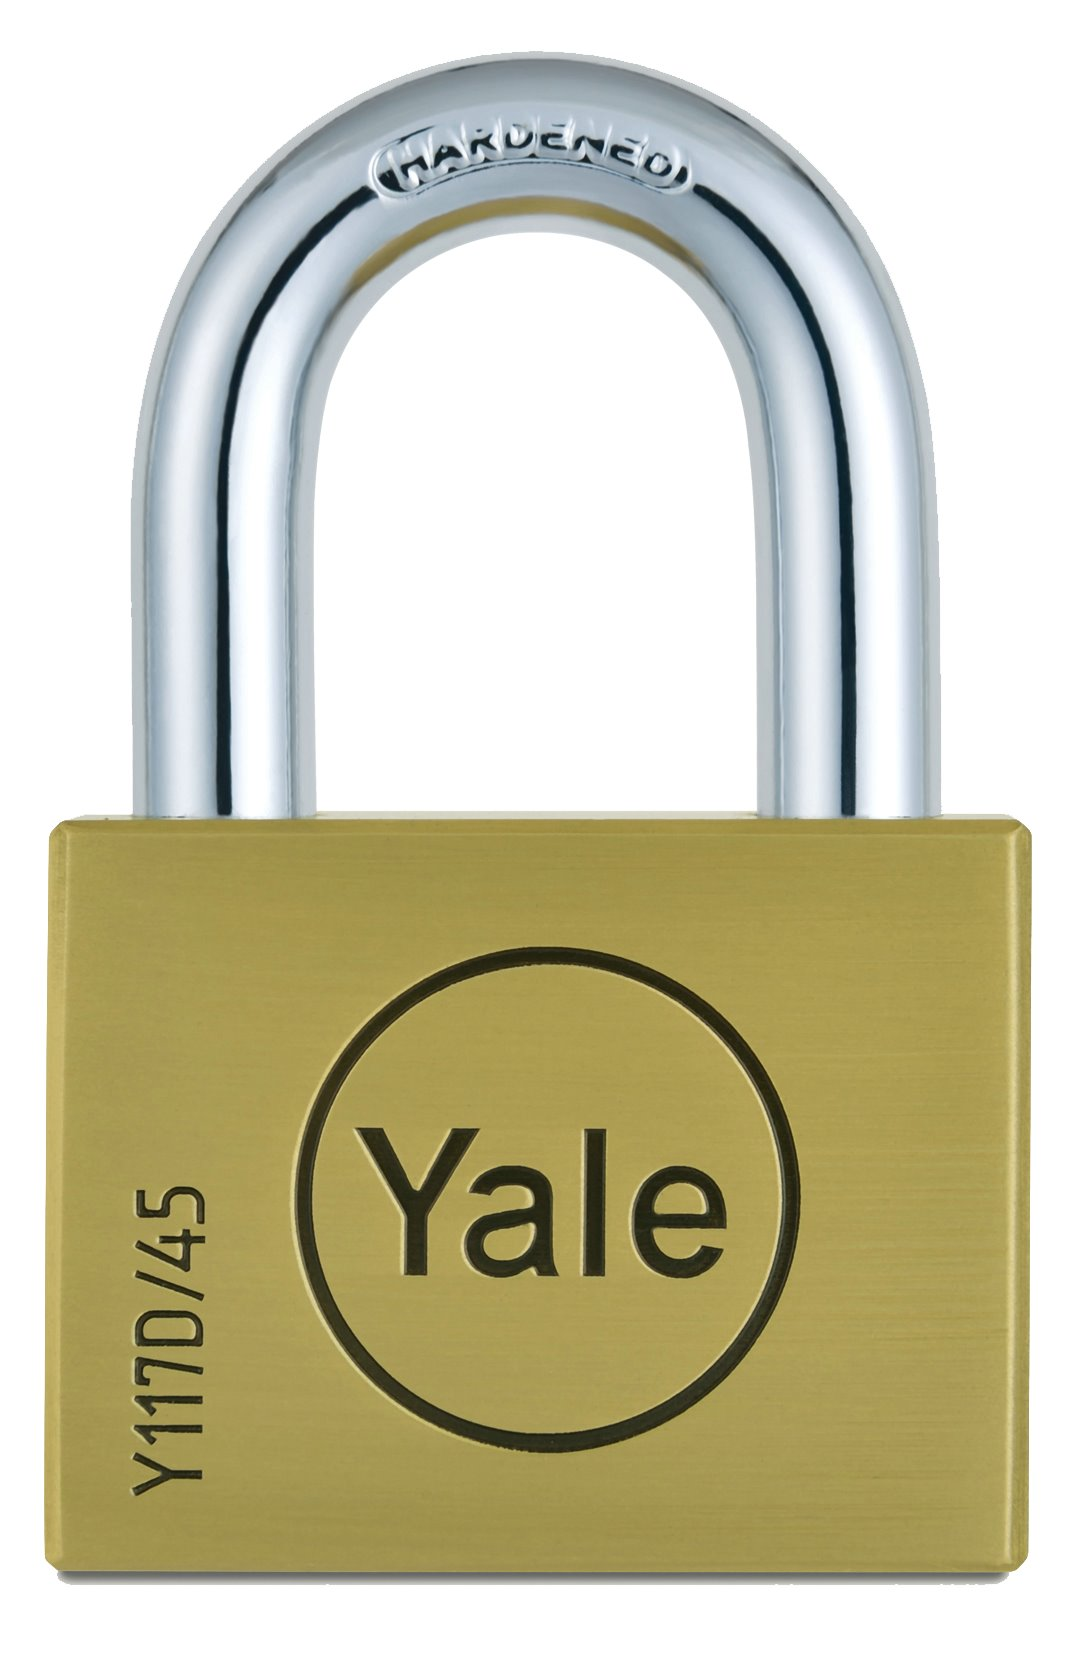 Y117D/45/127 - Yale Disc Padlock 45mm